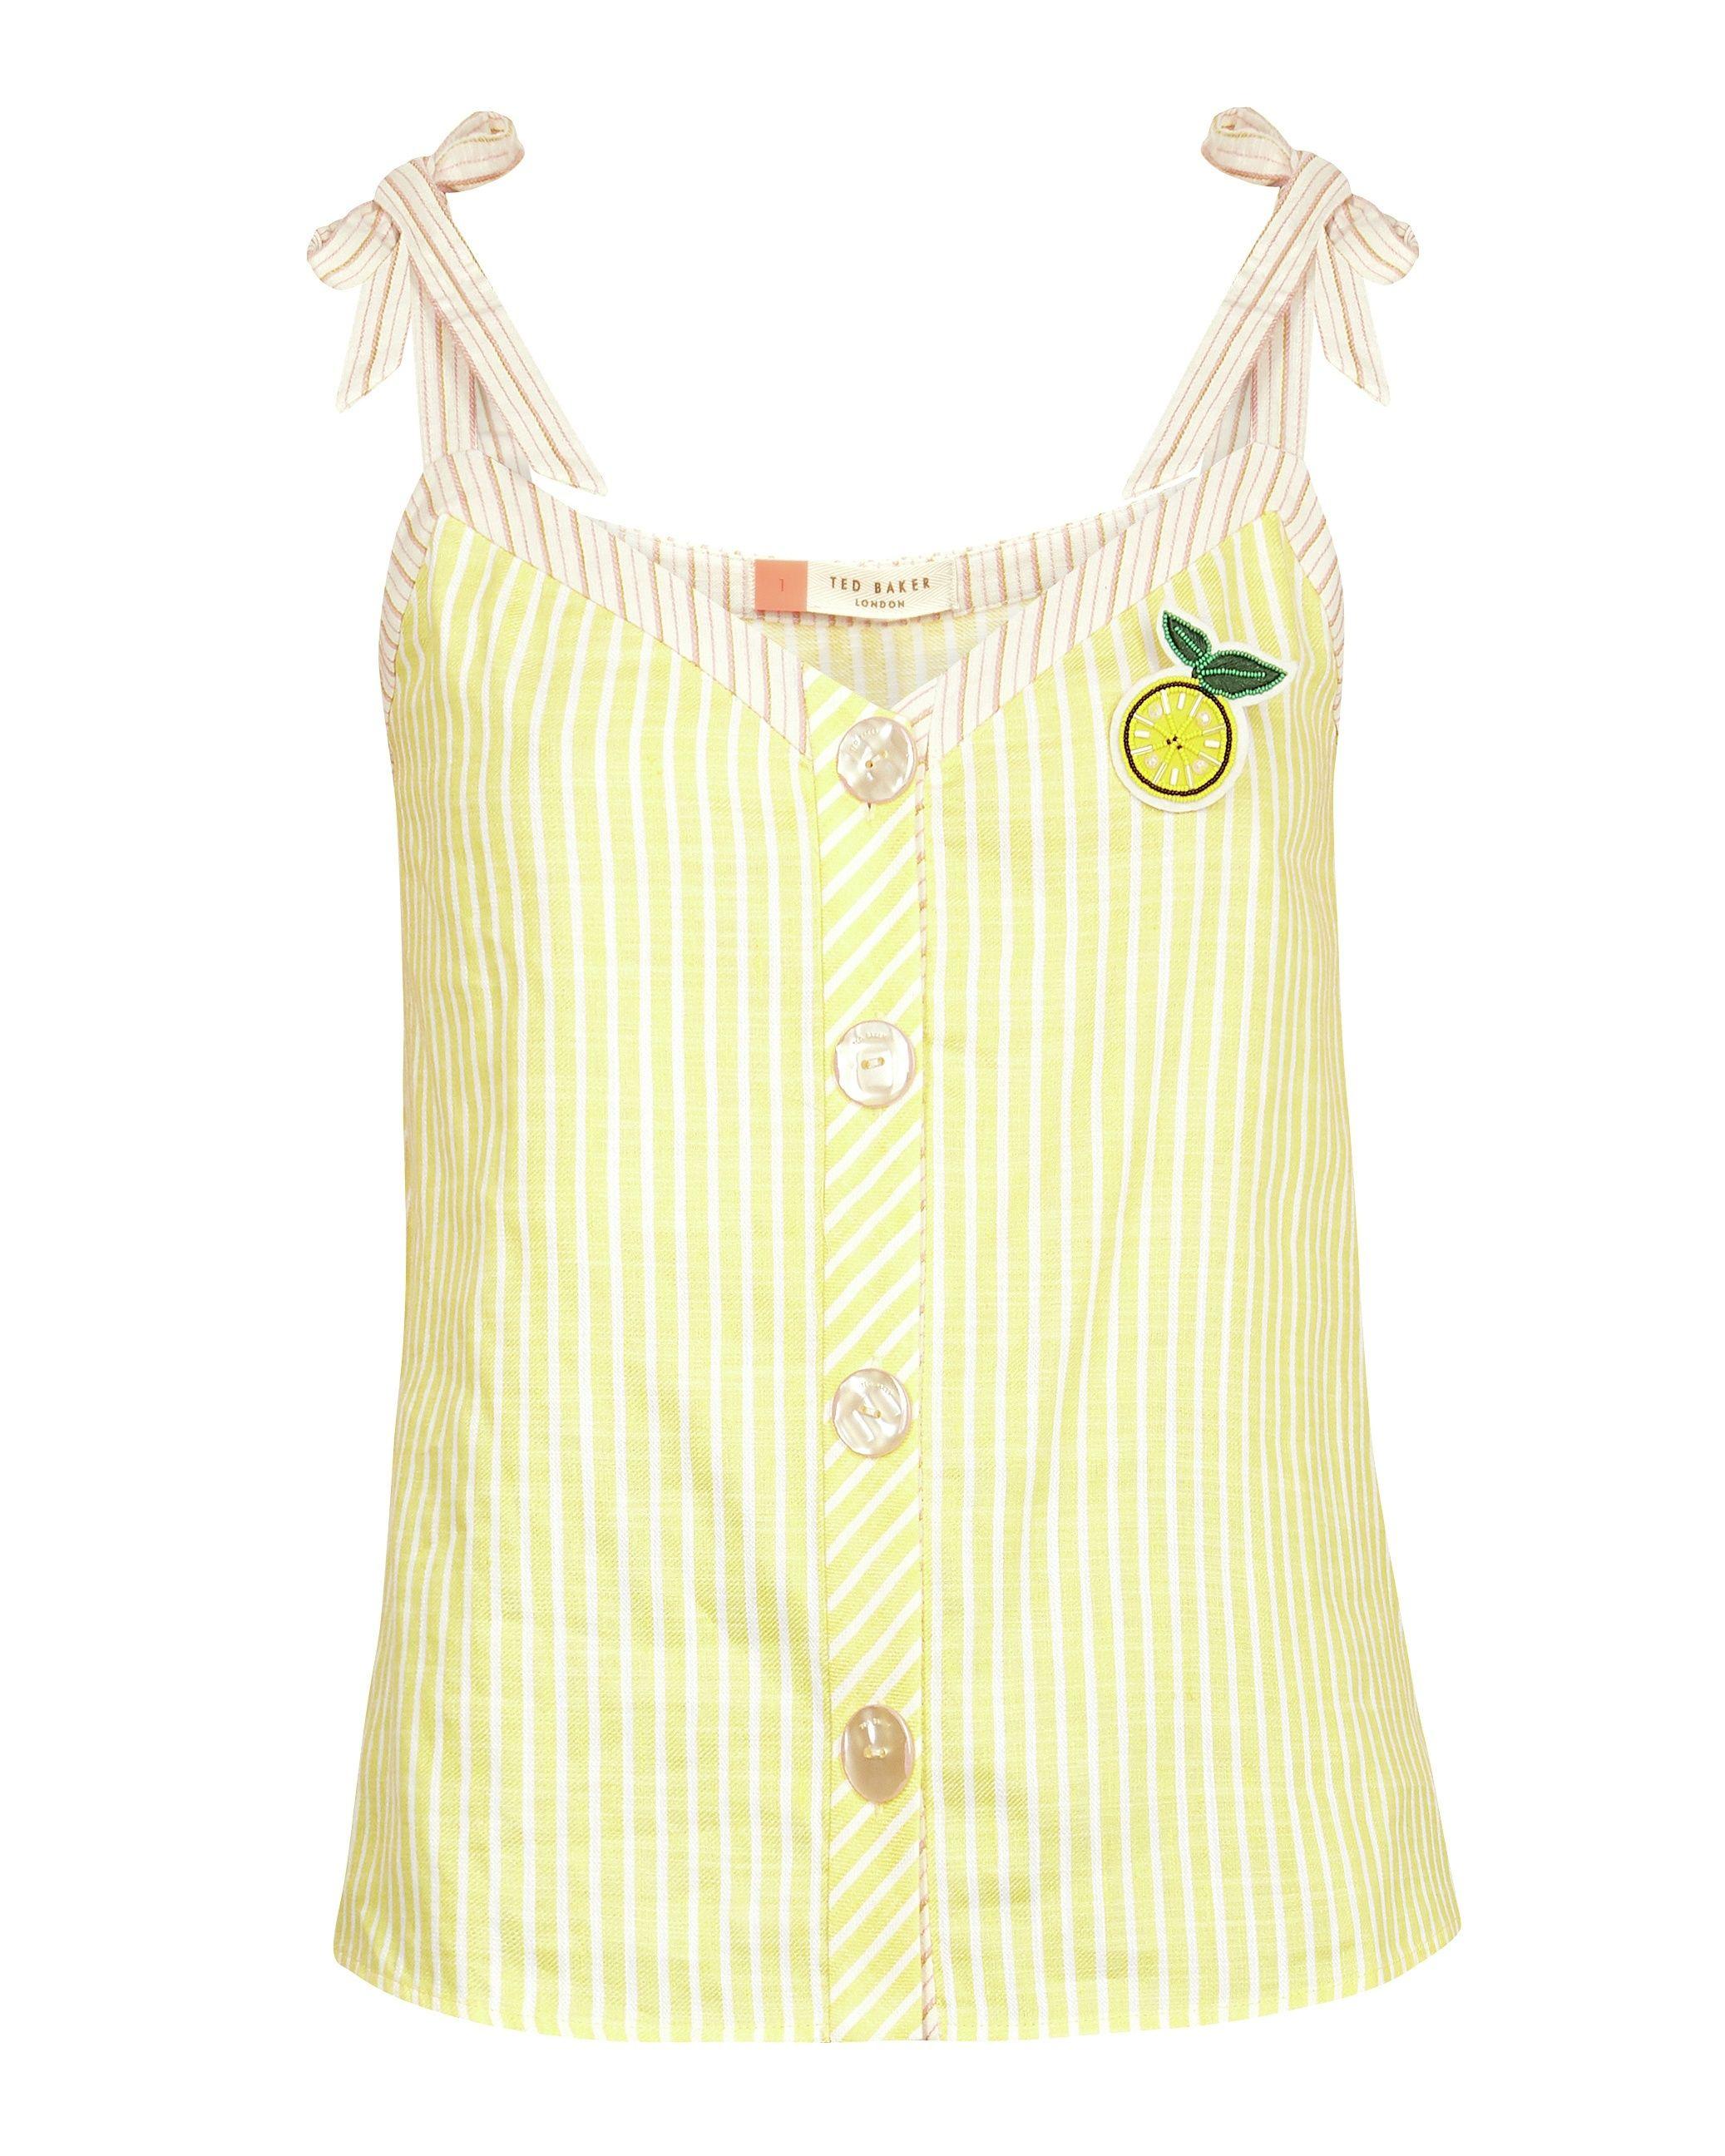 Ted Baker Asinara Cabin Linen Stripe Top in Yellow